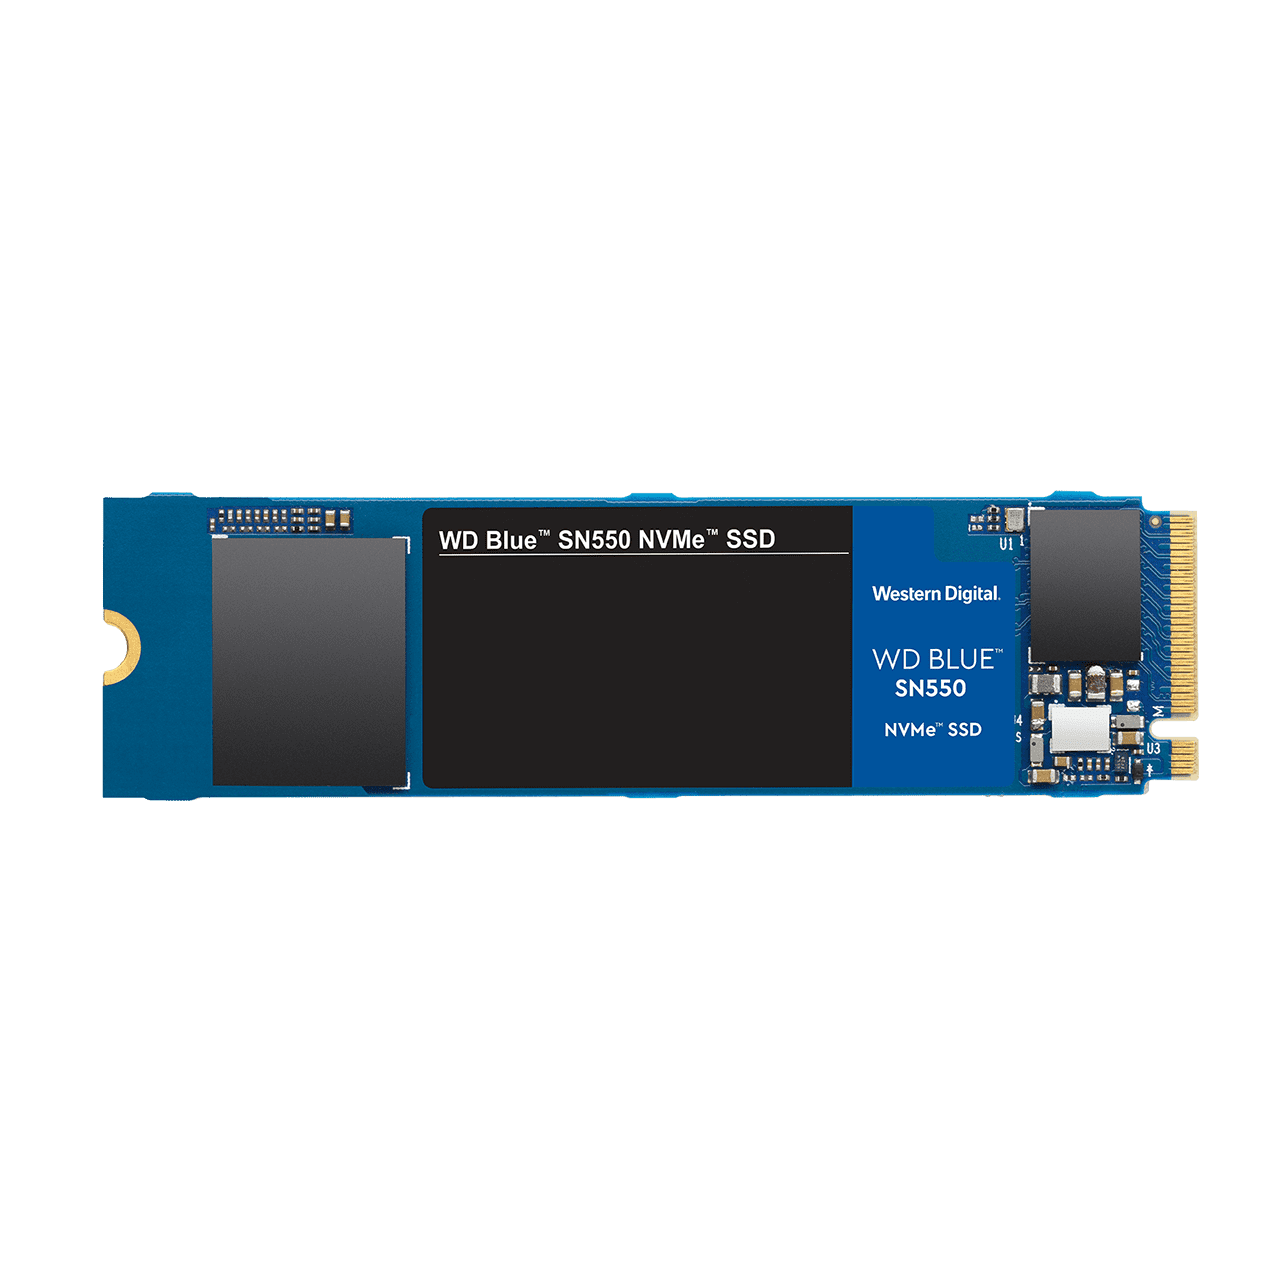 SSD 250GB WD Blue SN550 NVMe M.2 PCIe Gen3 2280